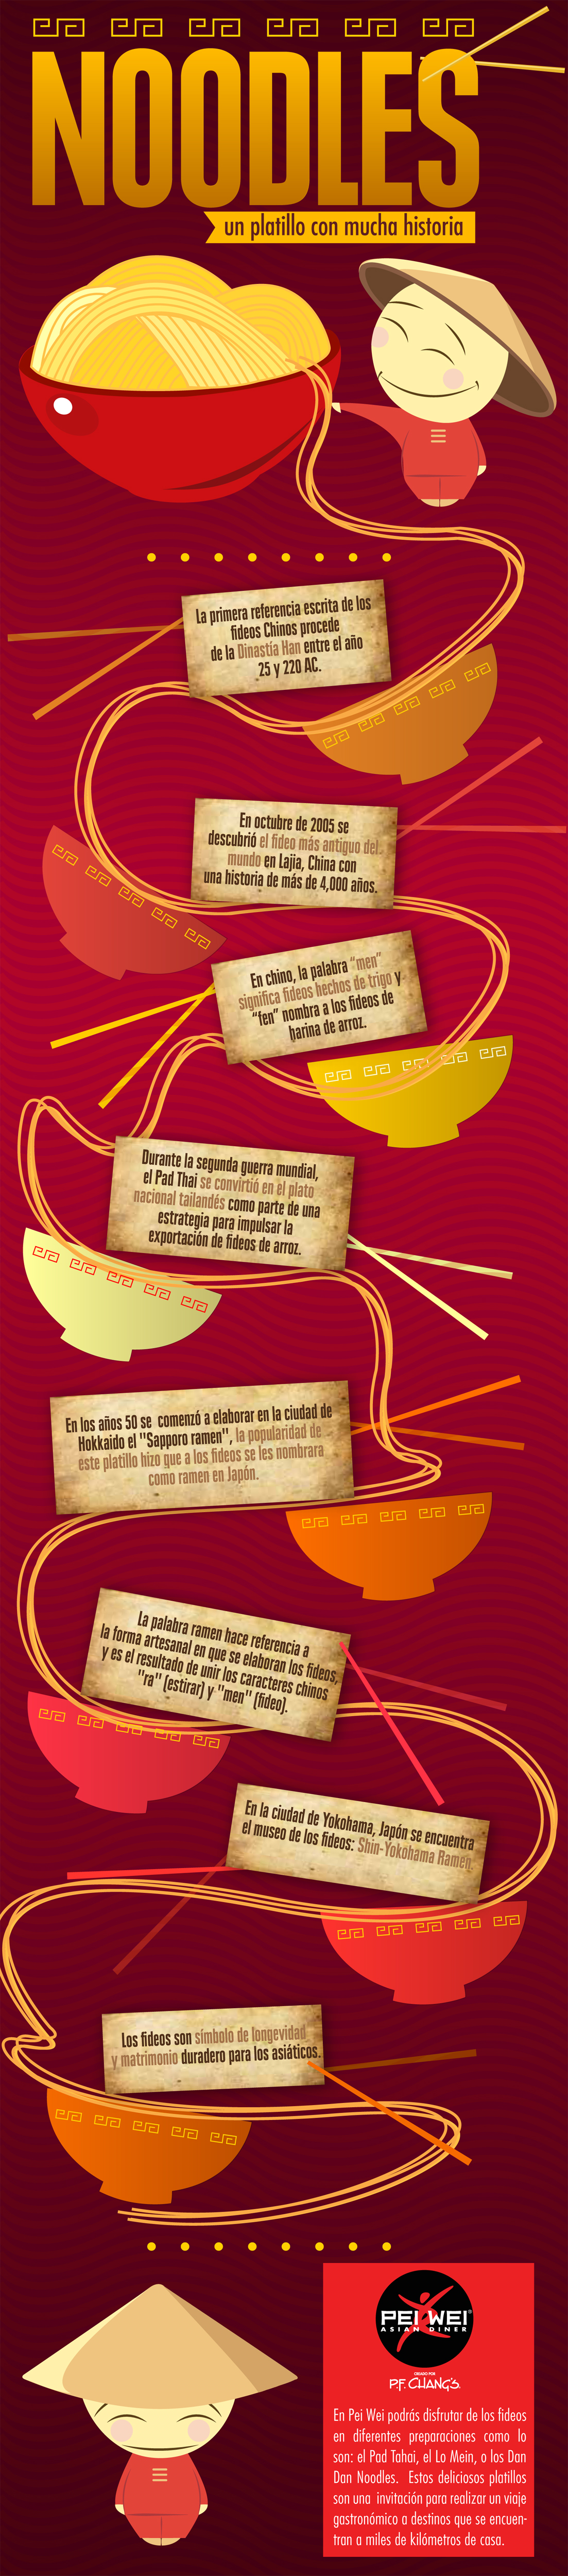 infograf'a_noodles